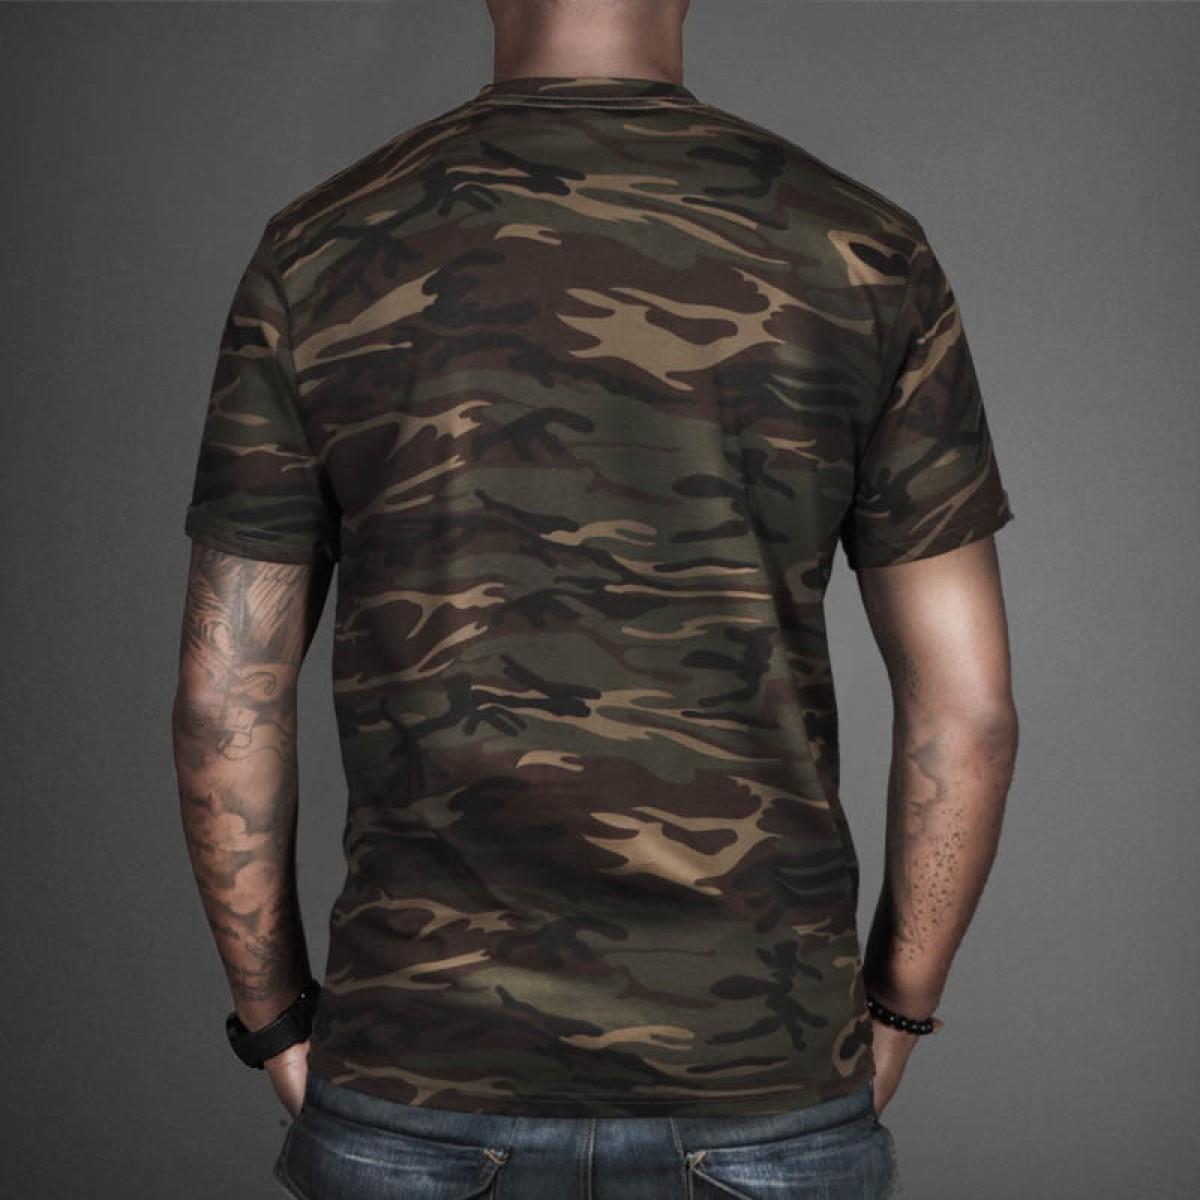 Hustle Gang Wallpaper Hustle gang t shirt by ti 1200x1200